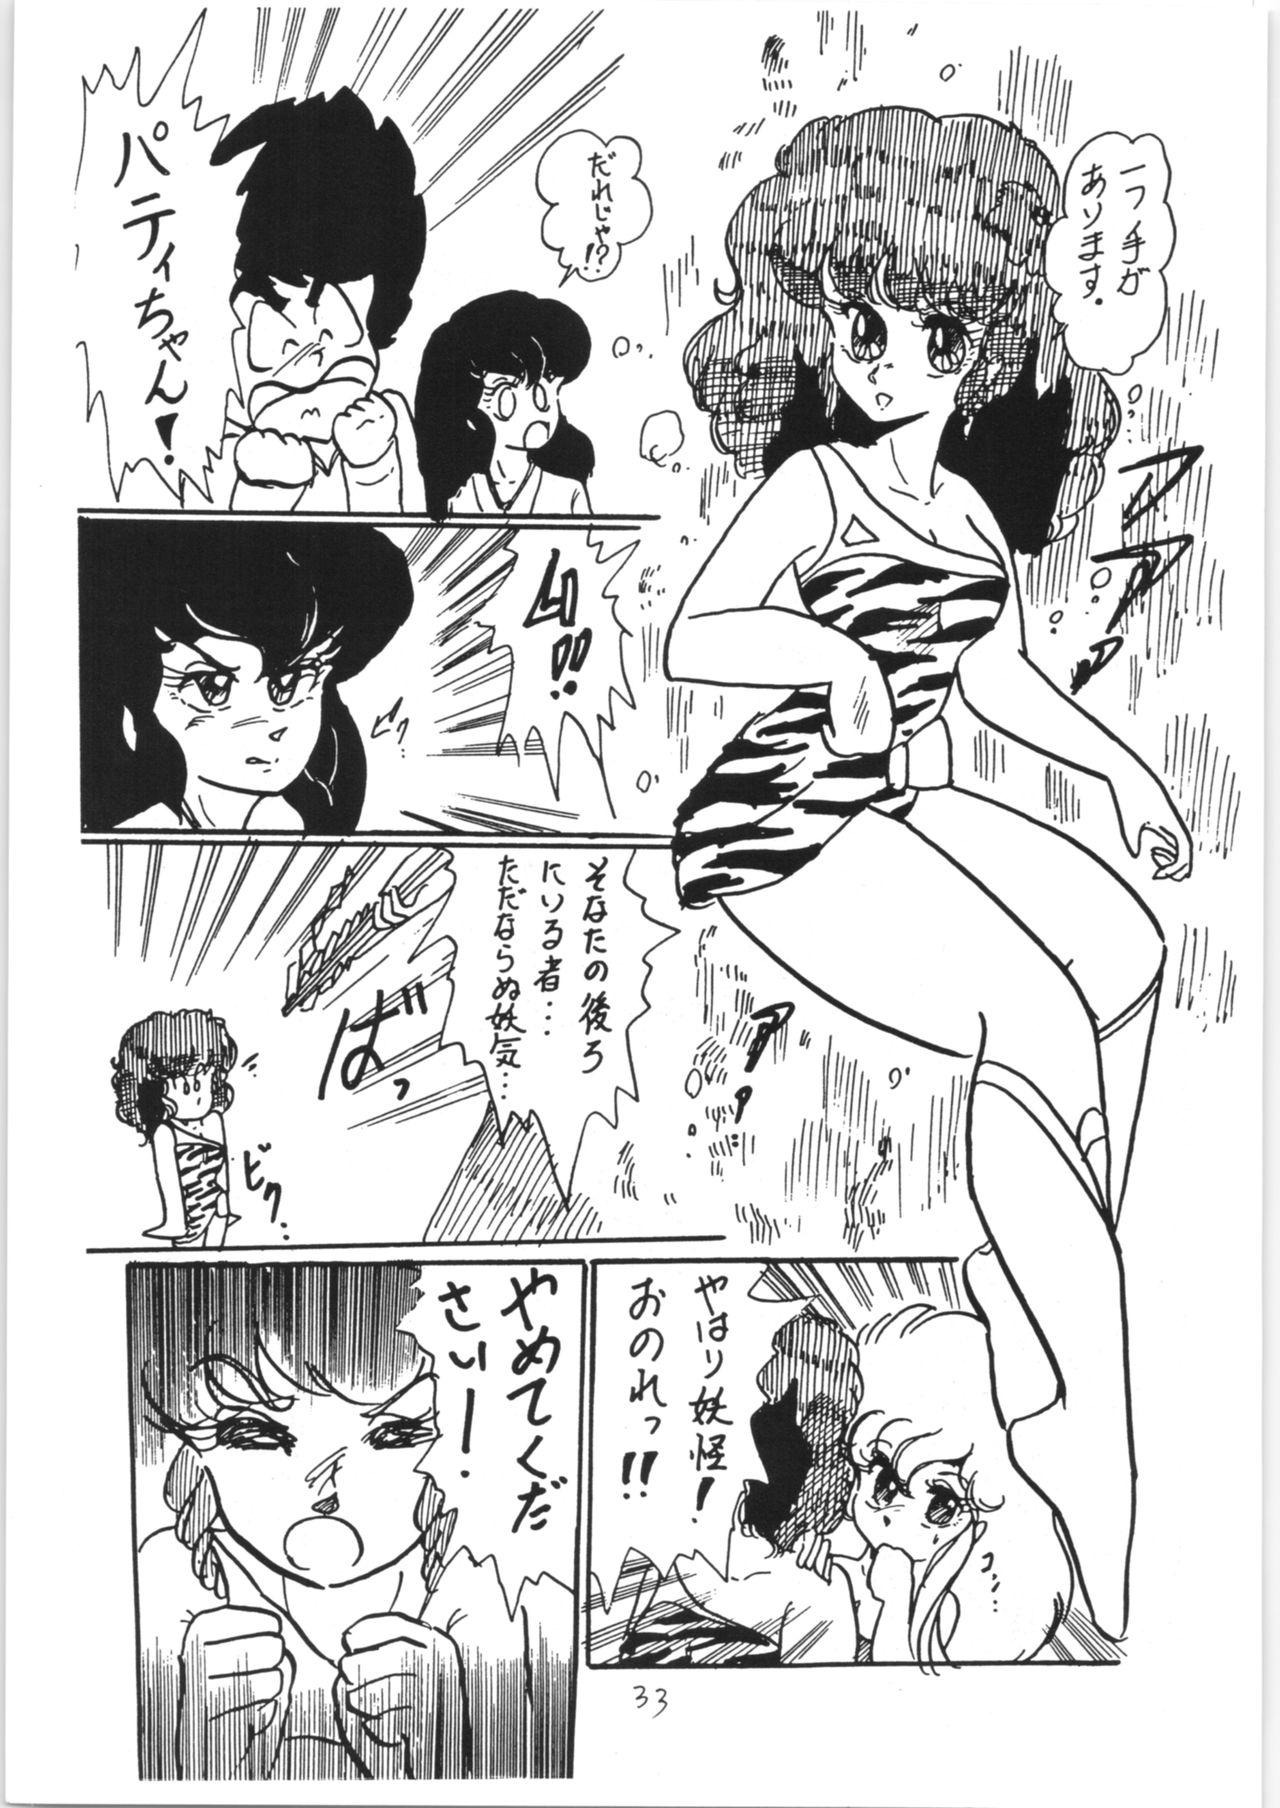 Ranma no Manma 3 v2 31